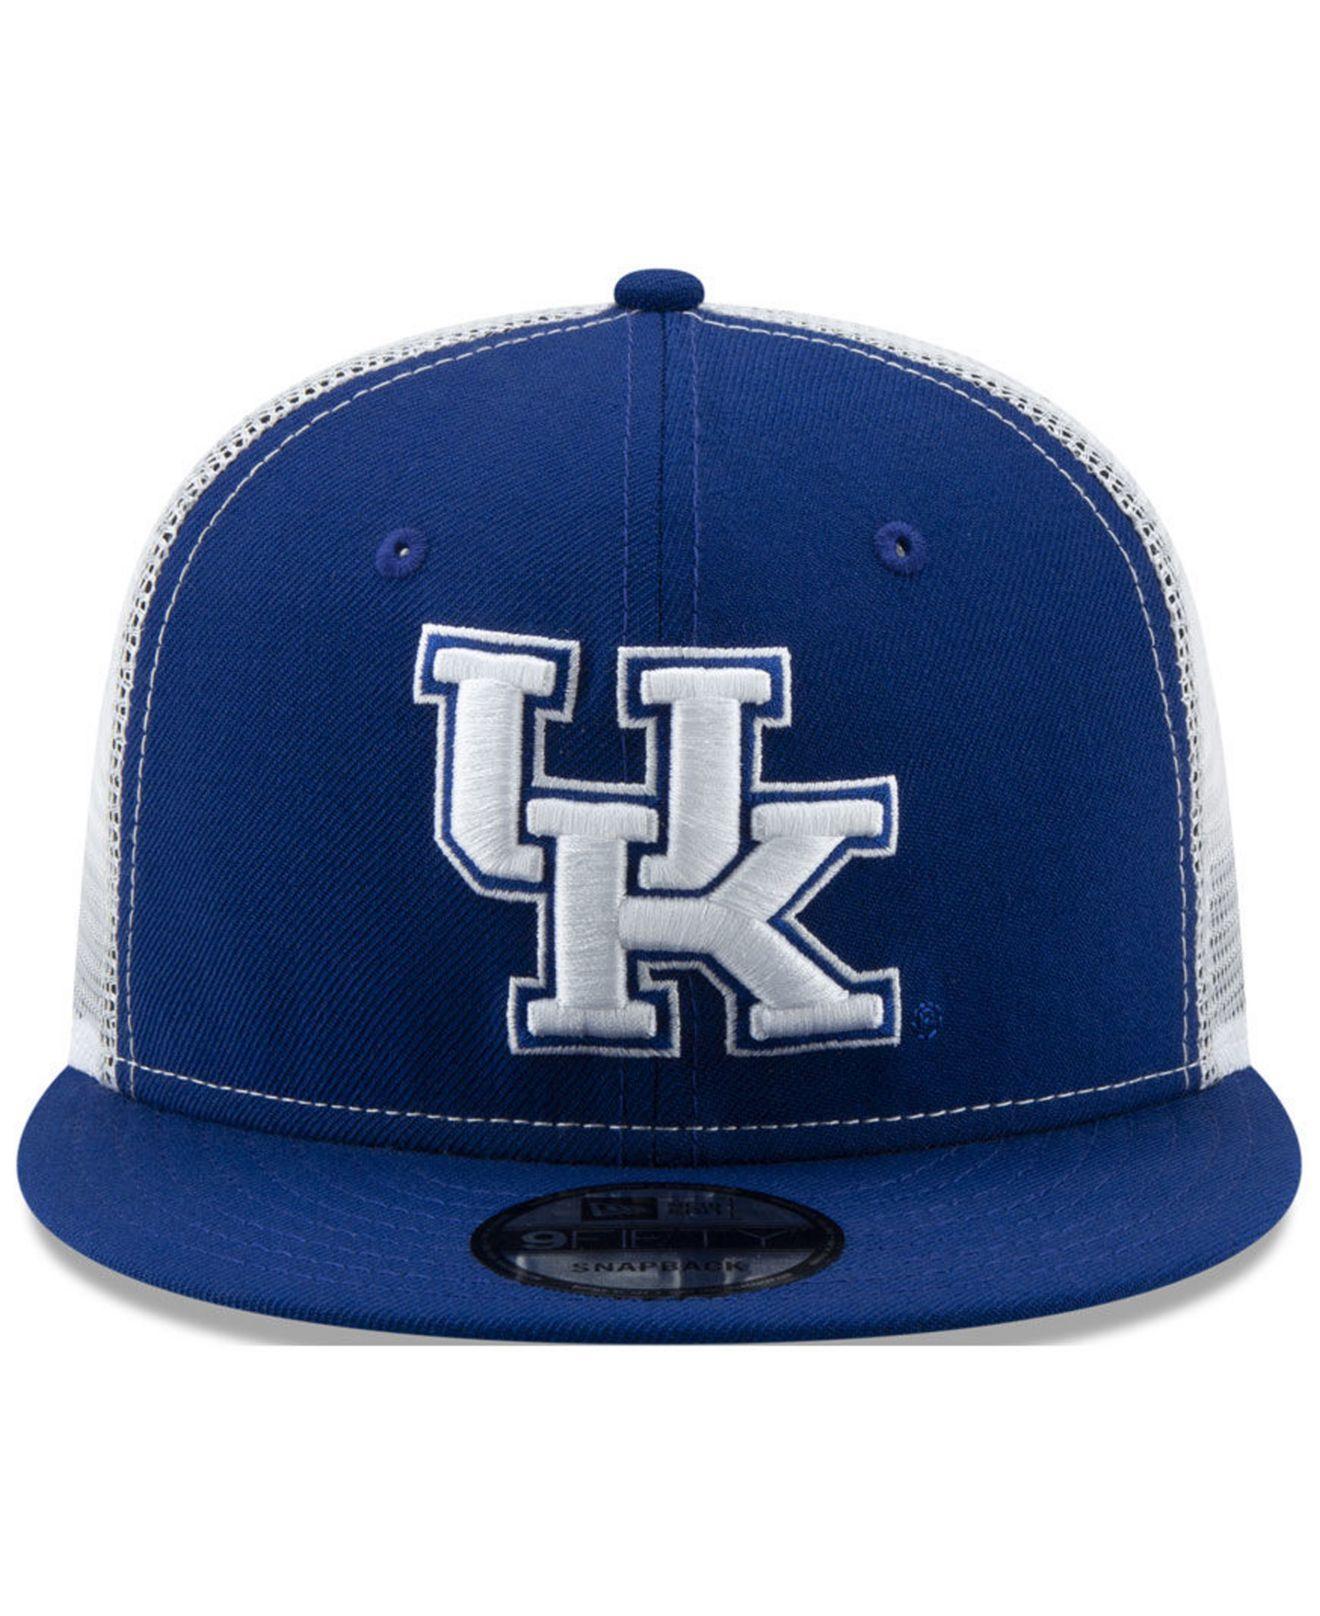 online store 7758a 15df6 Lyst - KTZ Kentucky Wildcats Tc Meshback Snapback Cap in Blue for Men